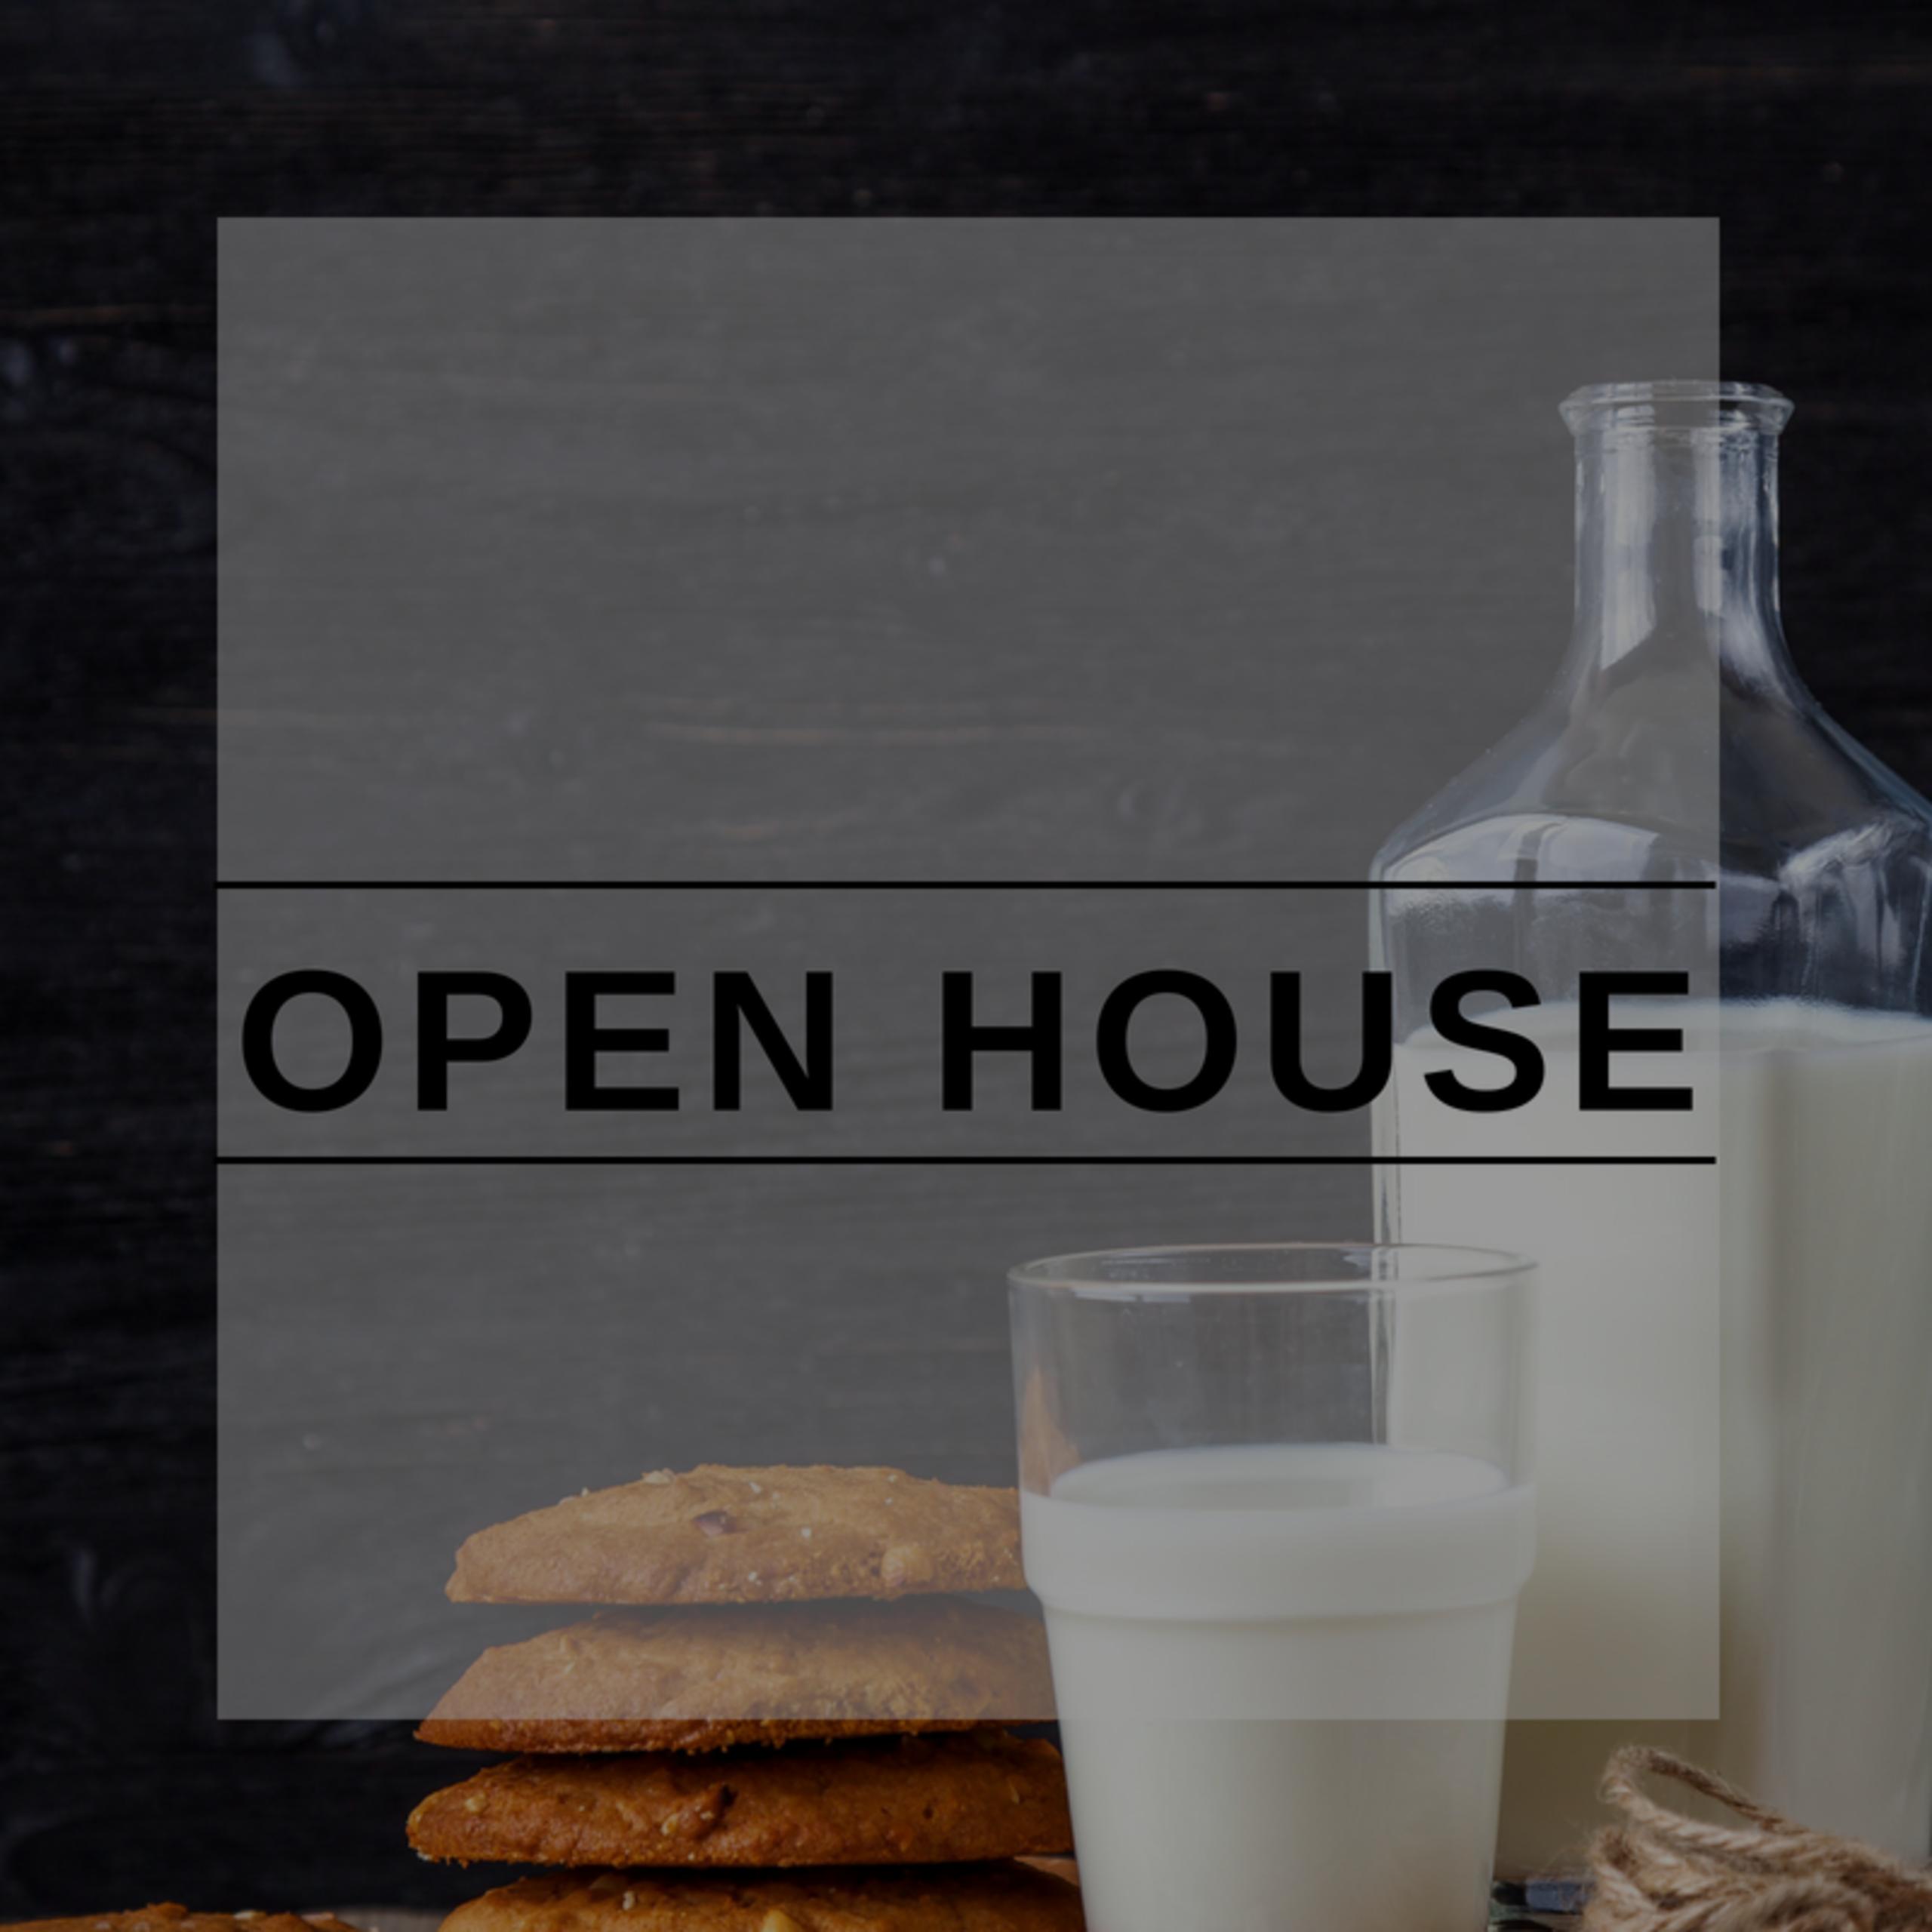 OPEN HOUSE LIST 8/18/18 – 8/19/18